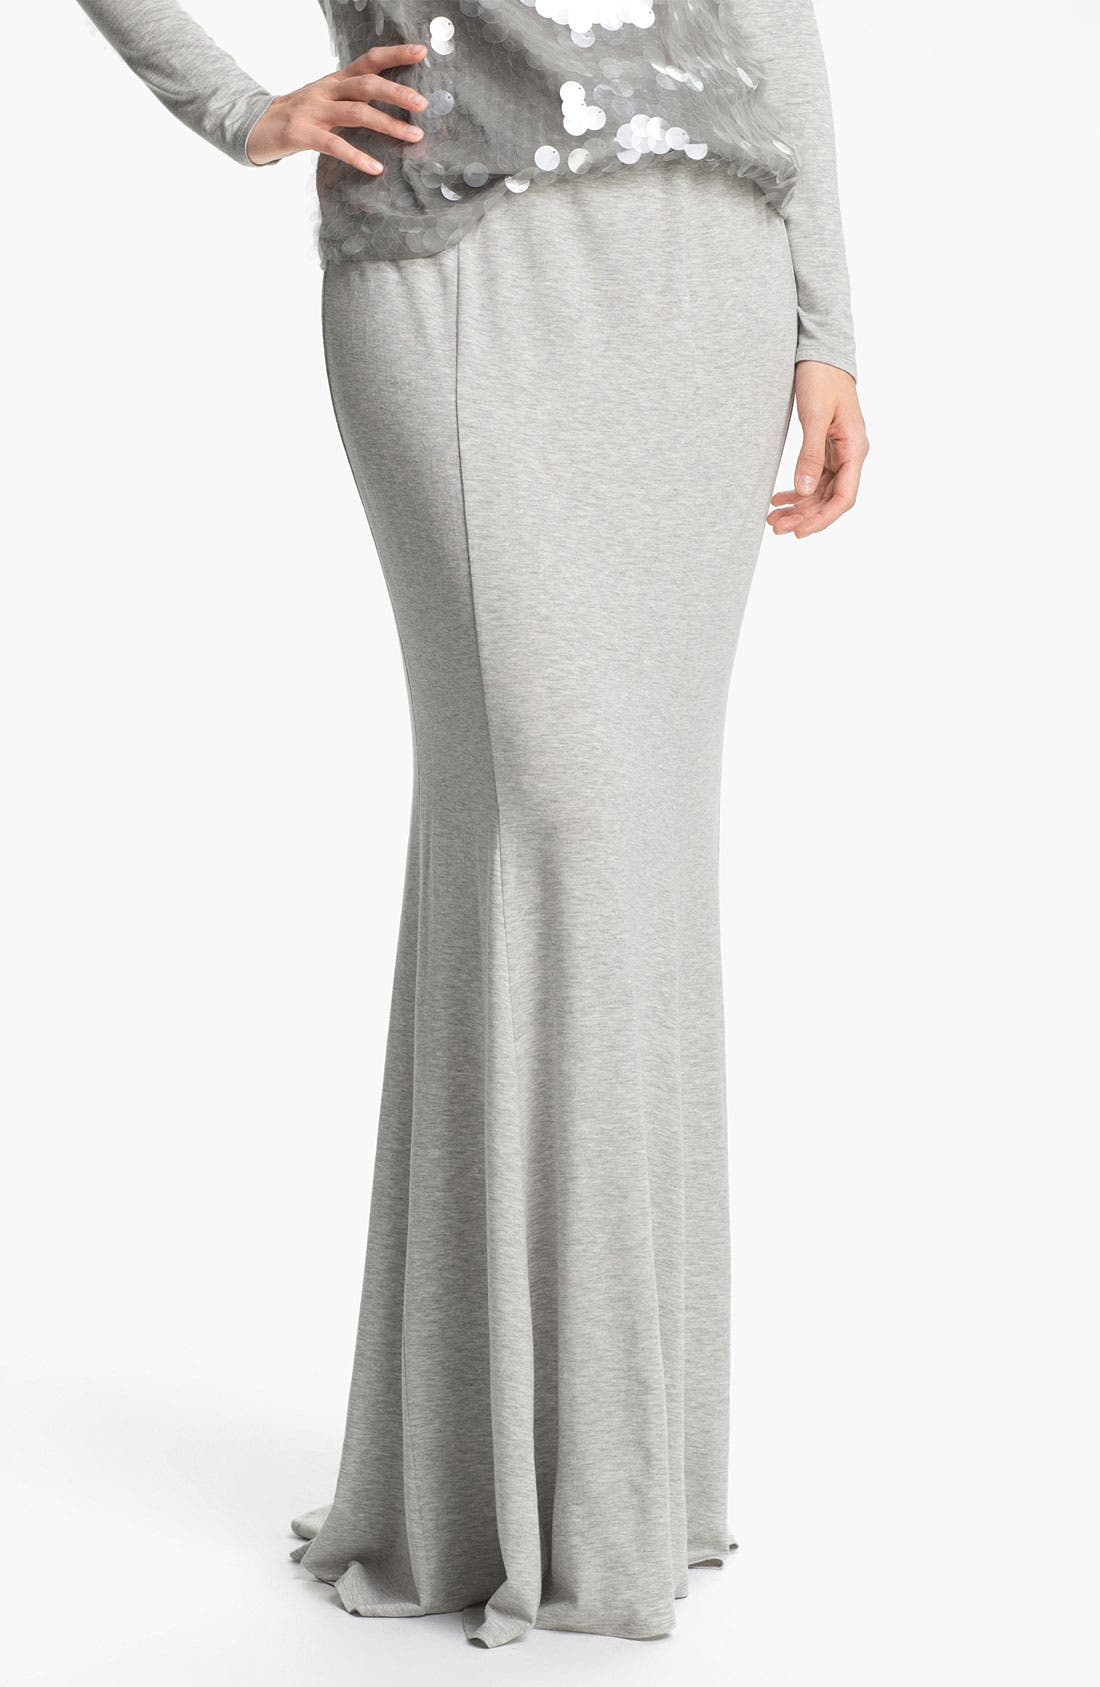 Alternate Image 1 Selected - Rachel Zoe 'Carli' Flared Maxi Skirt